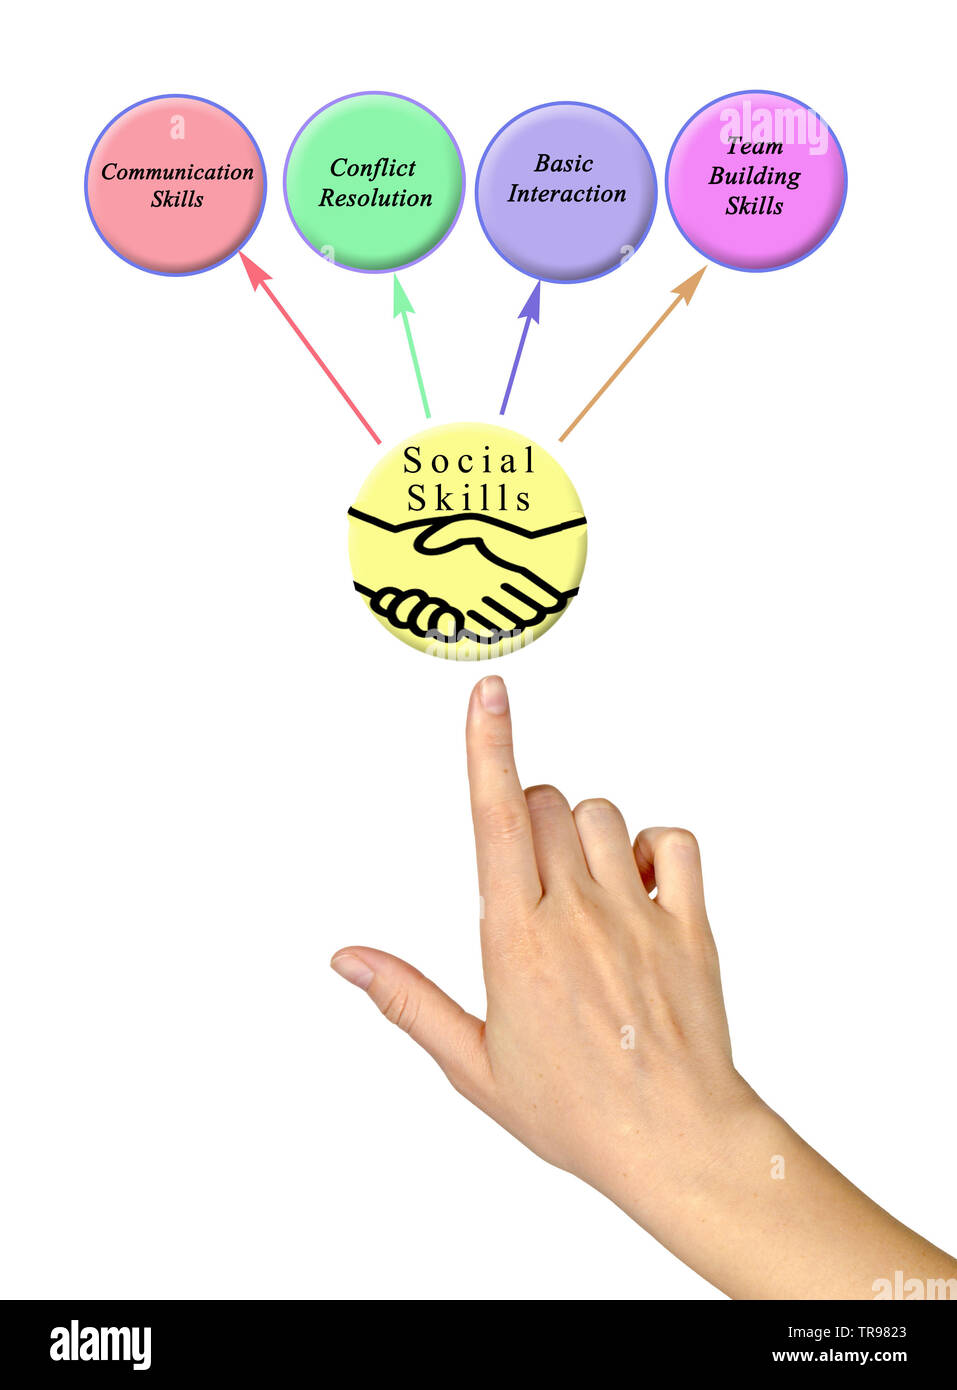 Four Social Skills - Stock Image